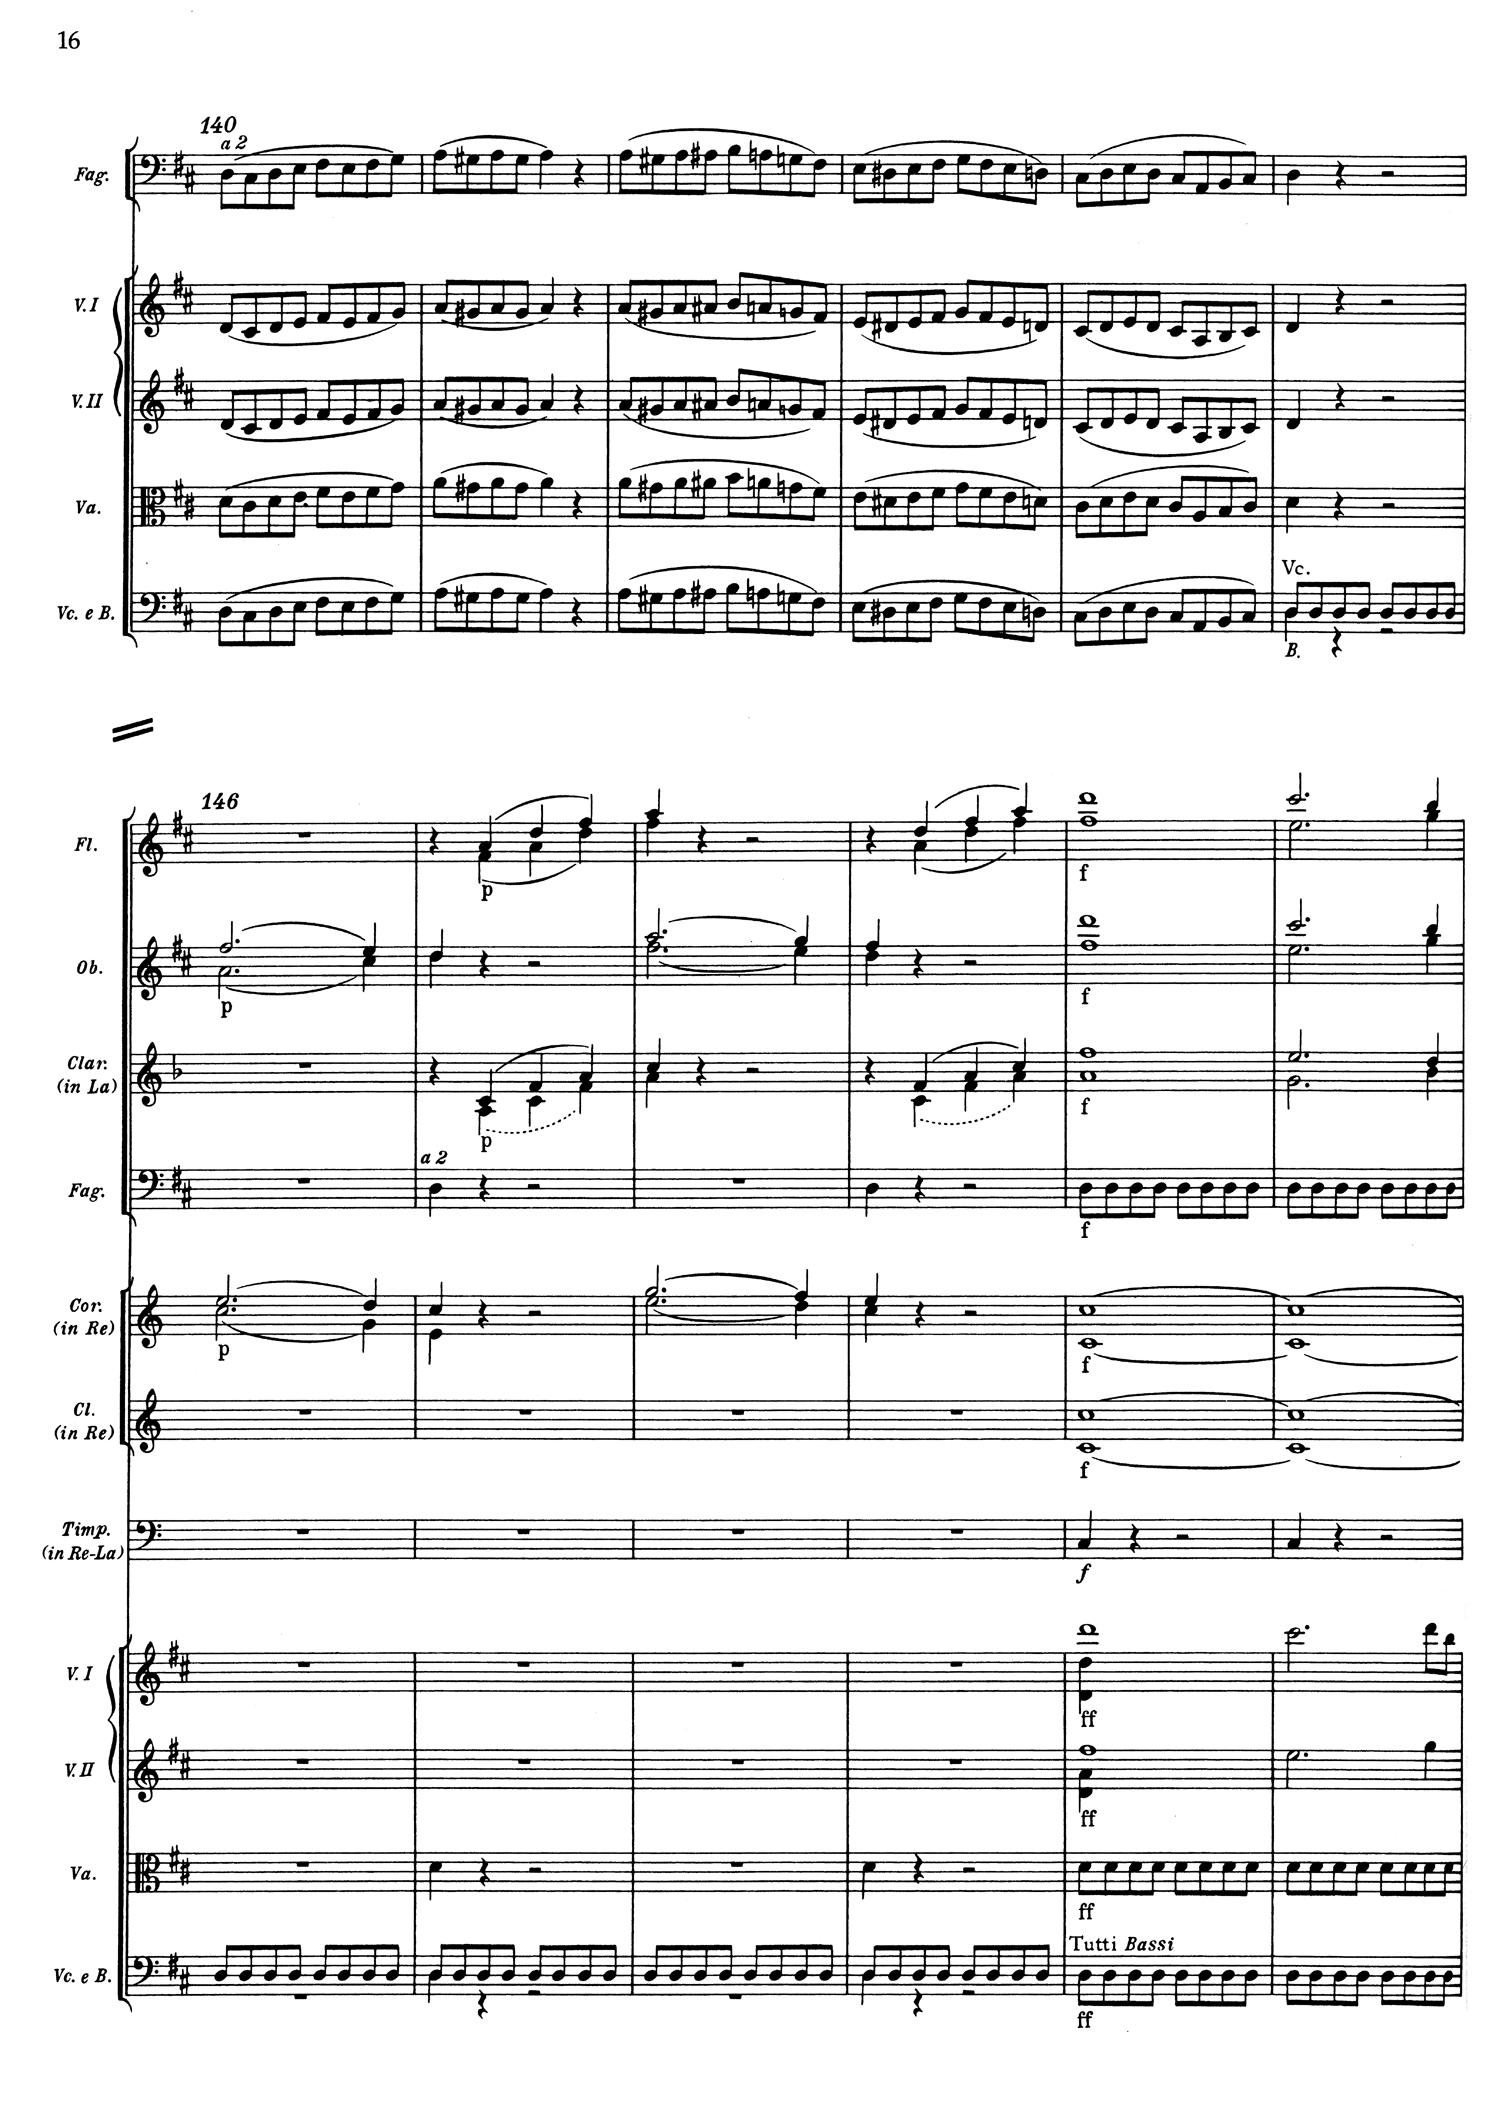 Mozart Figaro Score 8.jpg